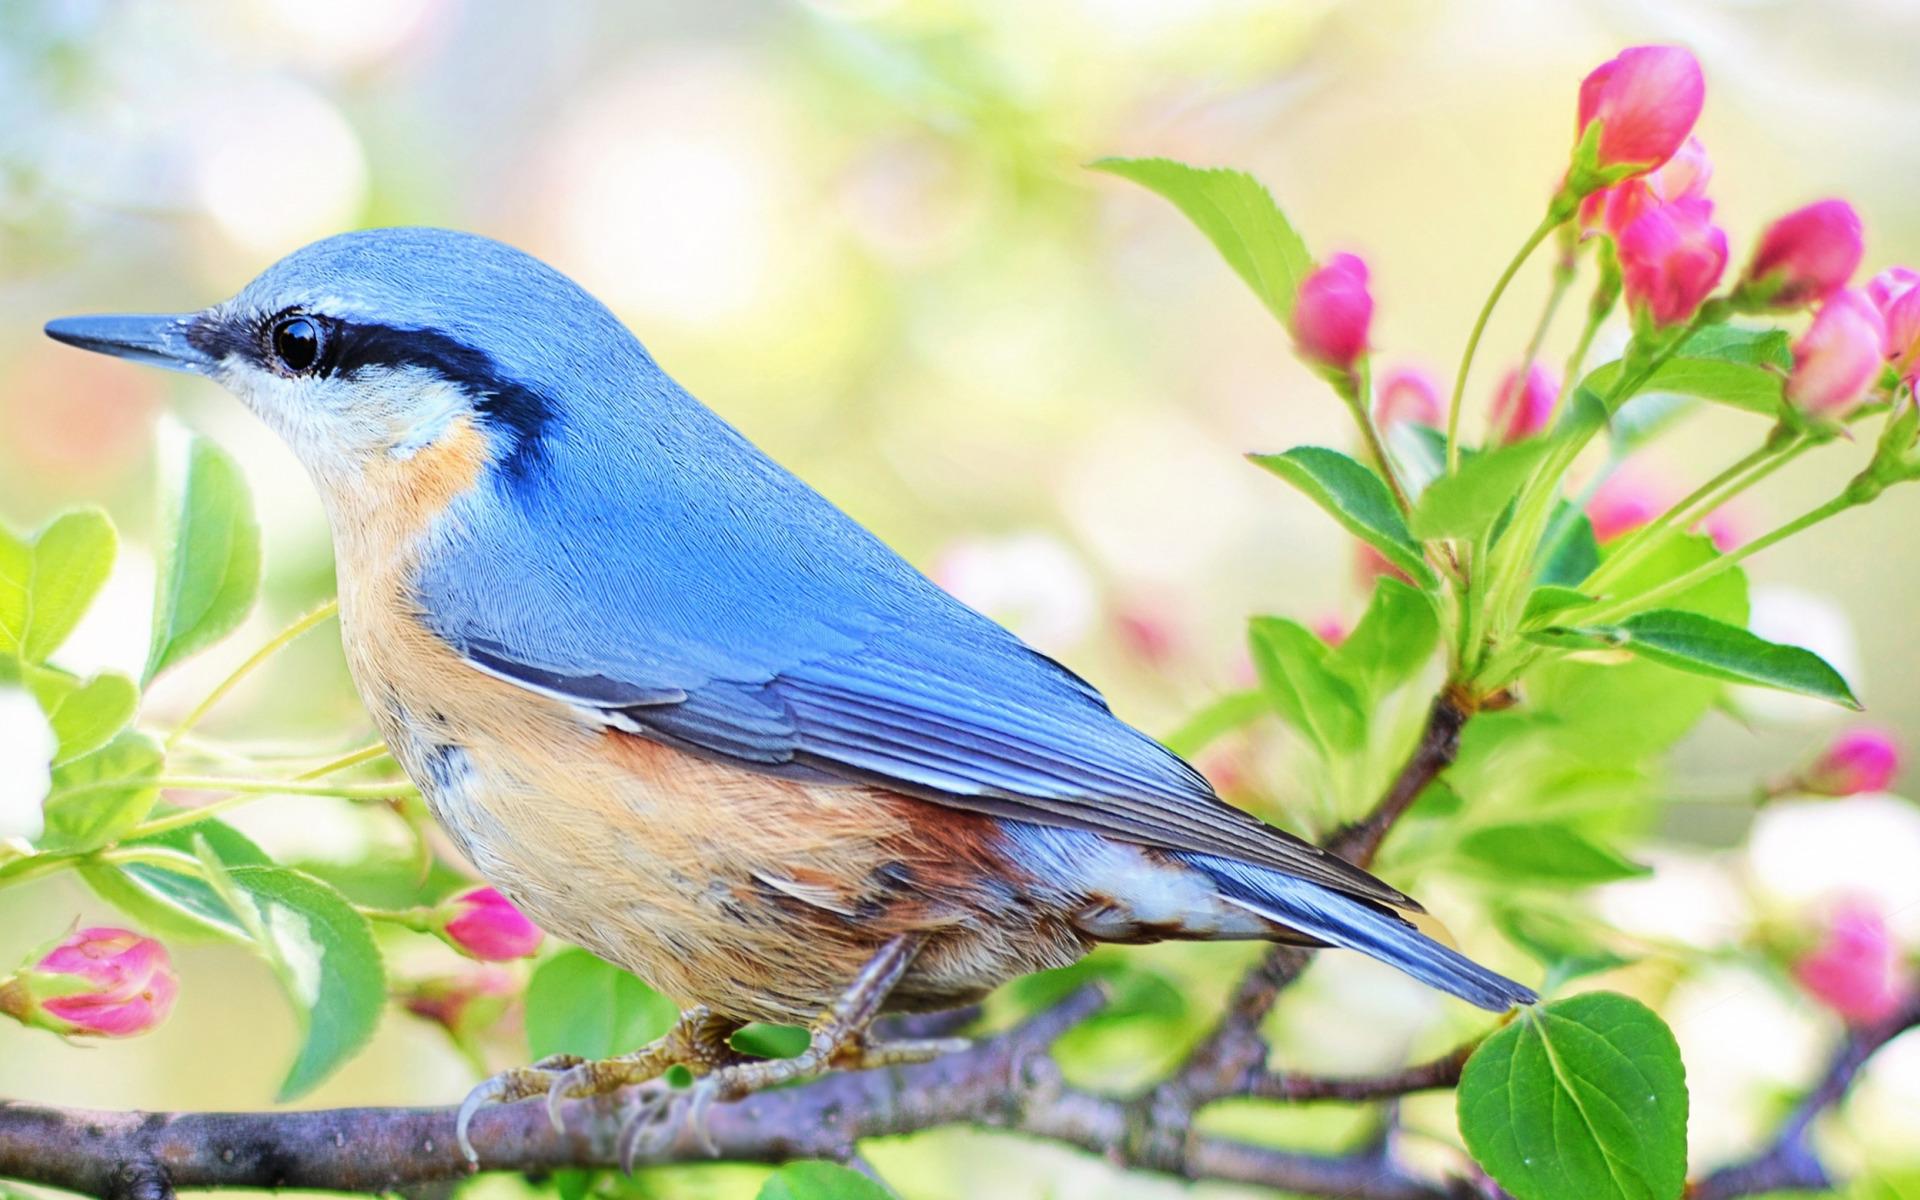 природа картинки птички проходят одном